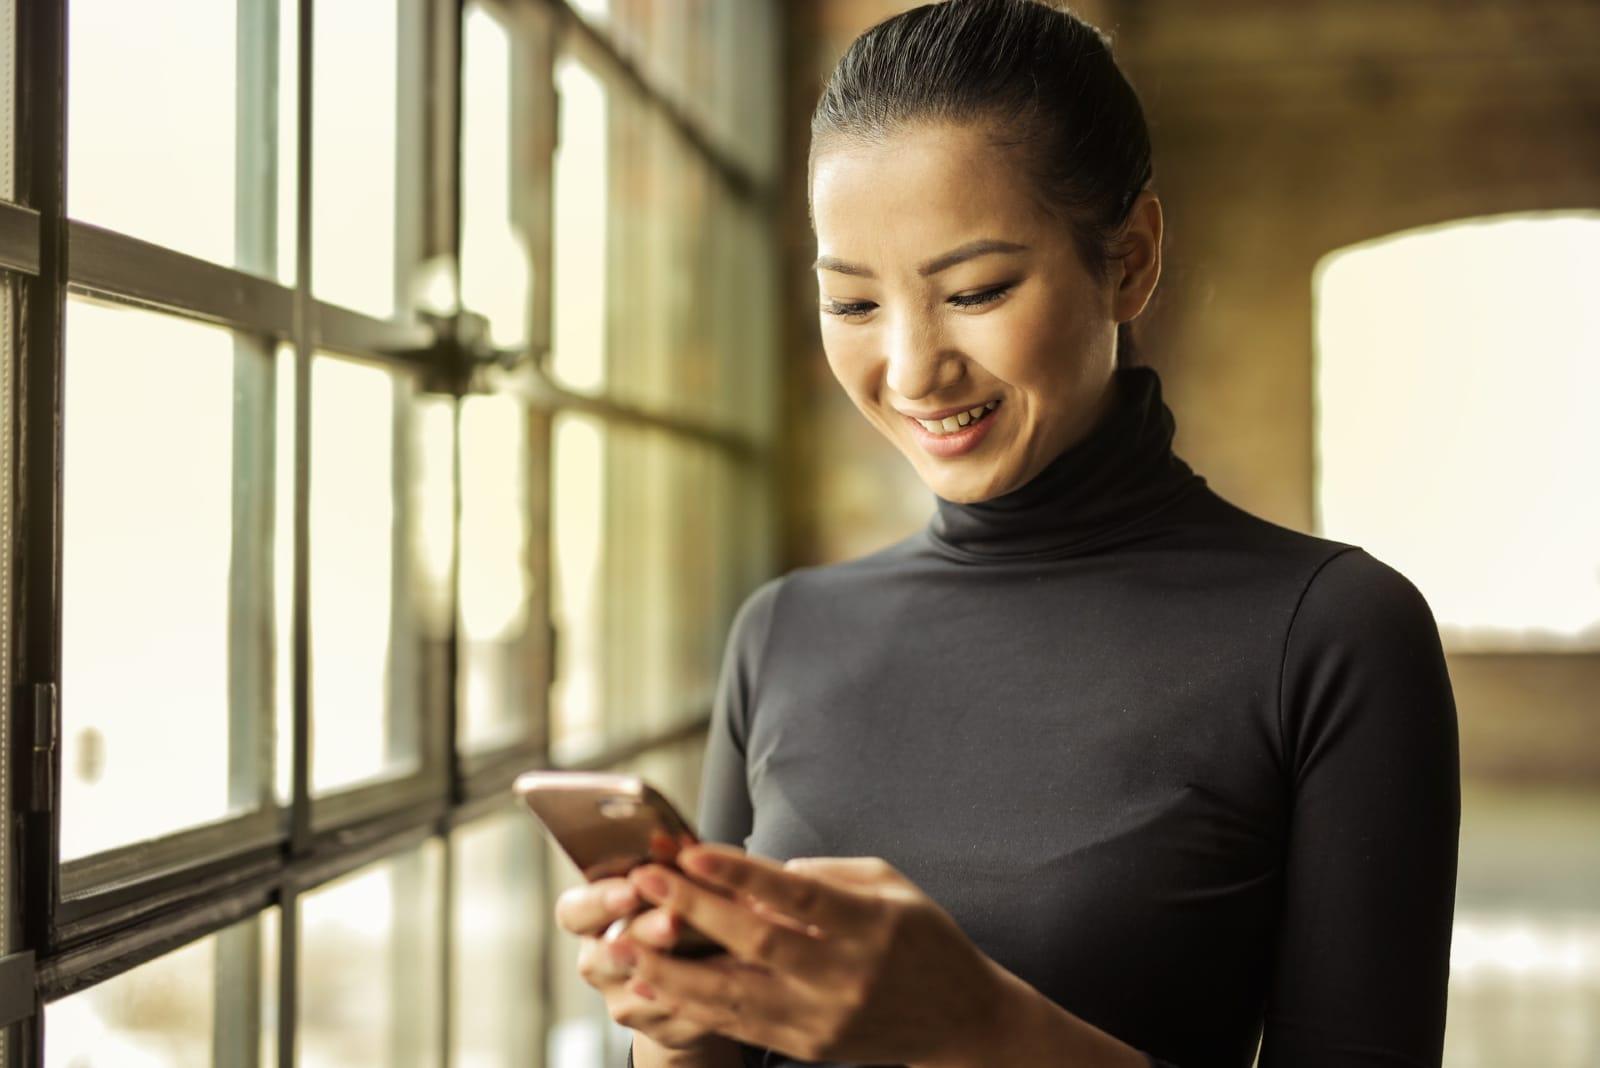 happy woman in black turtleneck holding smartphone